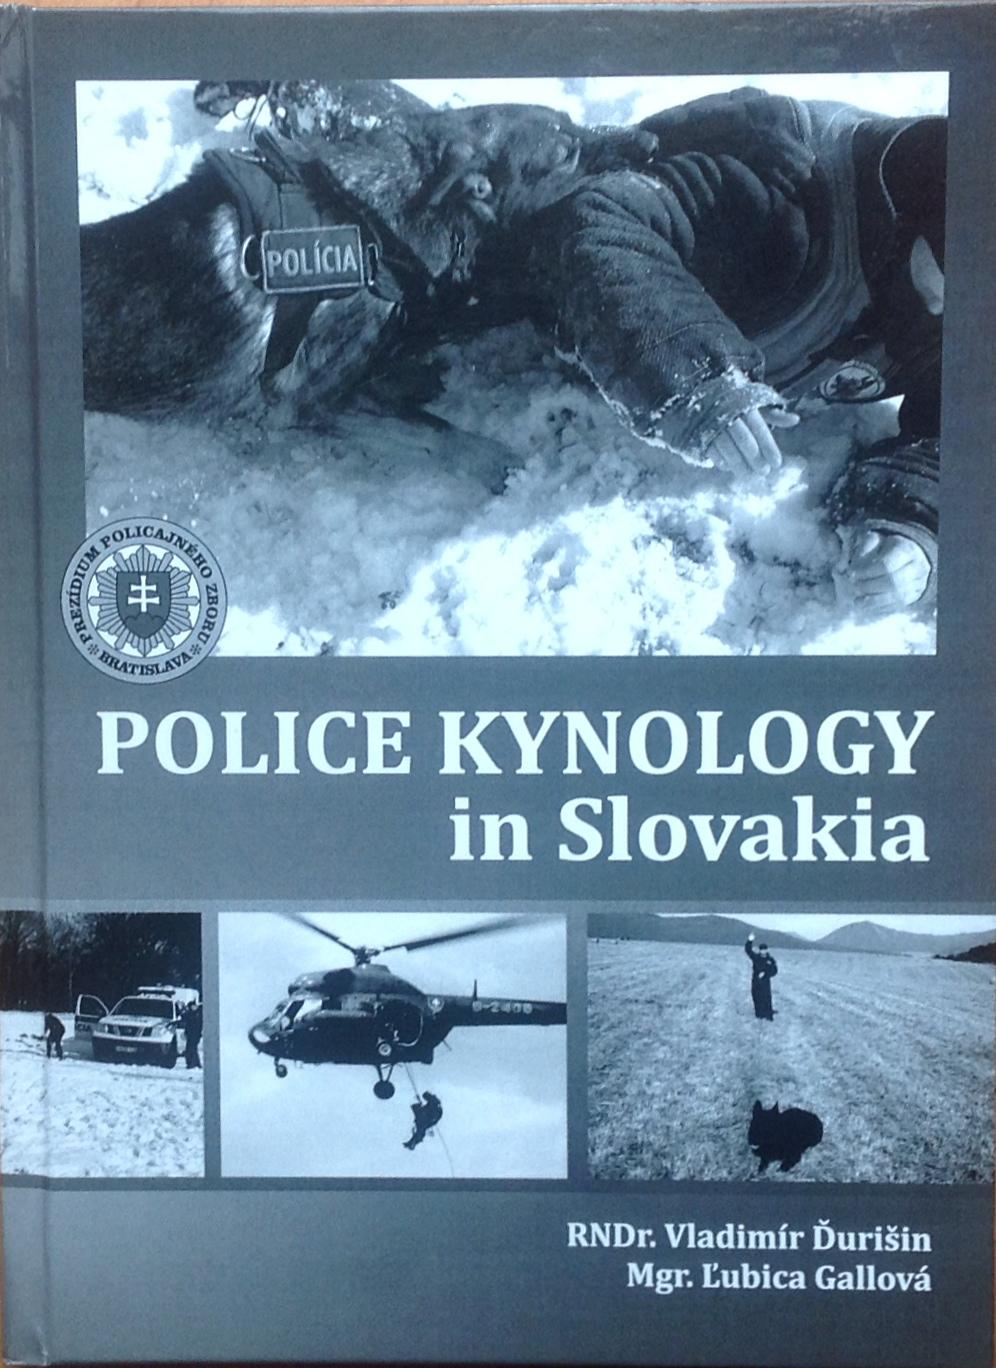 Police kynology in Slovakia-7